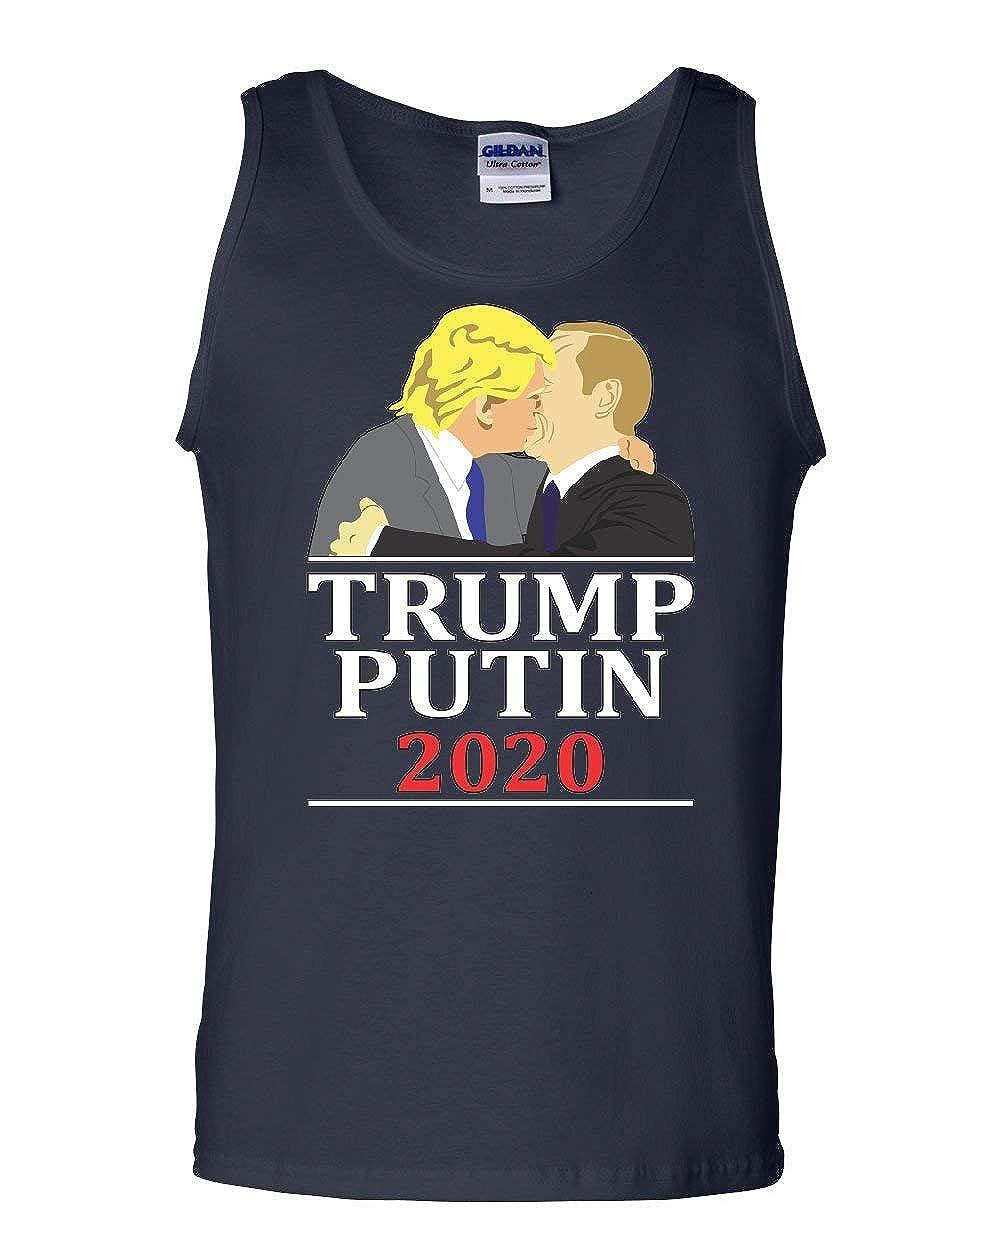 Trump and Putin Kissing Tank Top Funny Anti Trump Russia Election Sleeveless